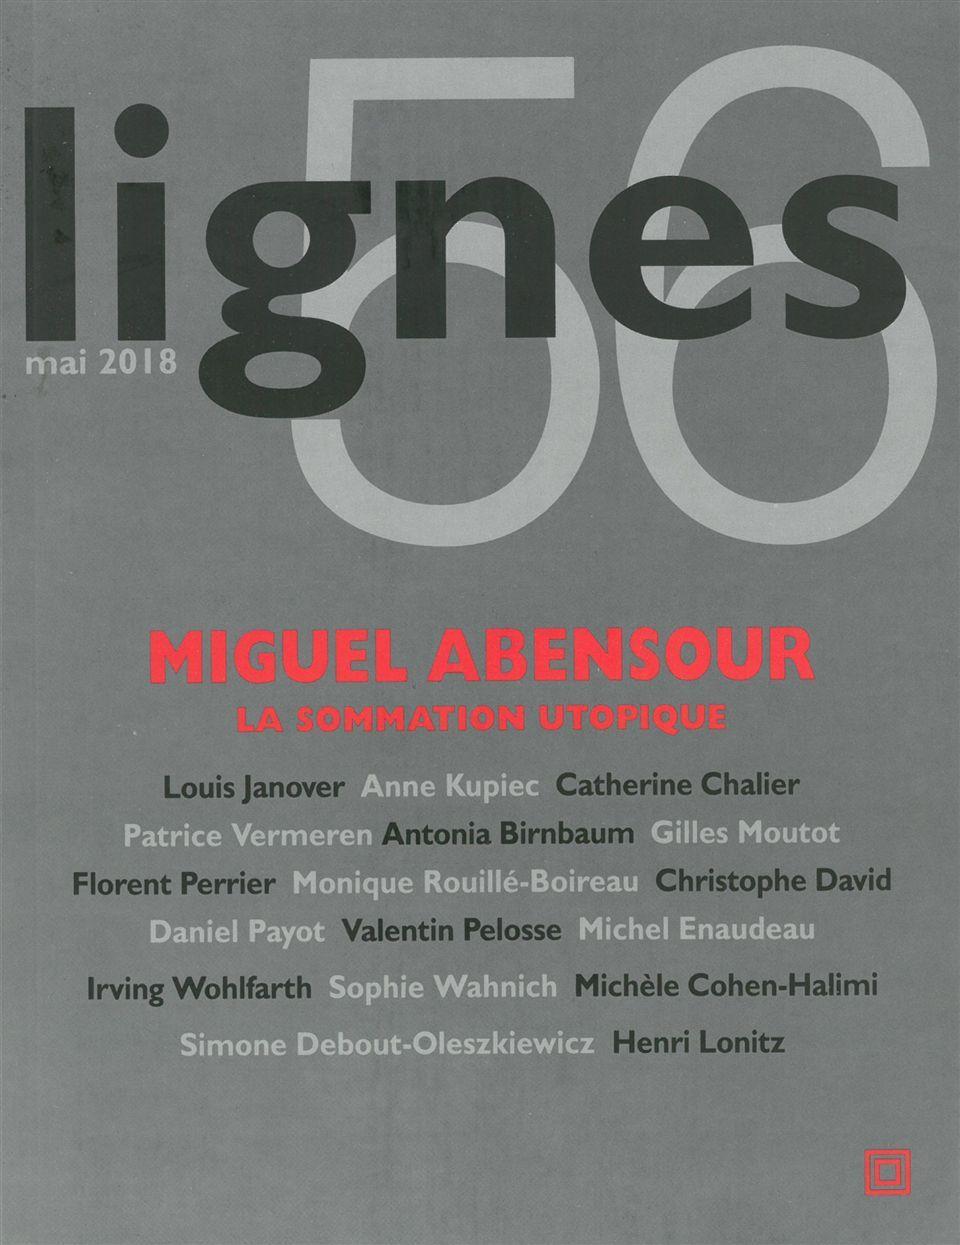 REVUE LIGNES N56